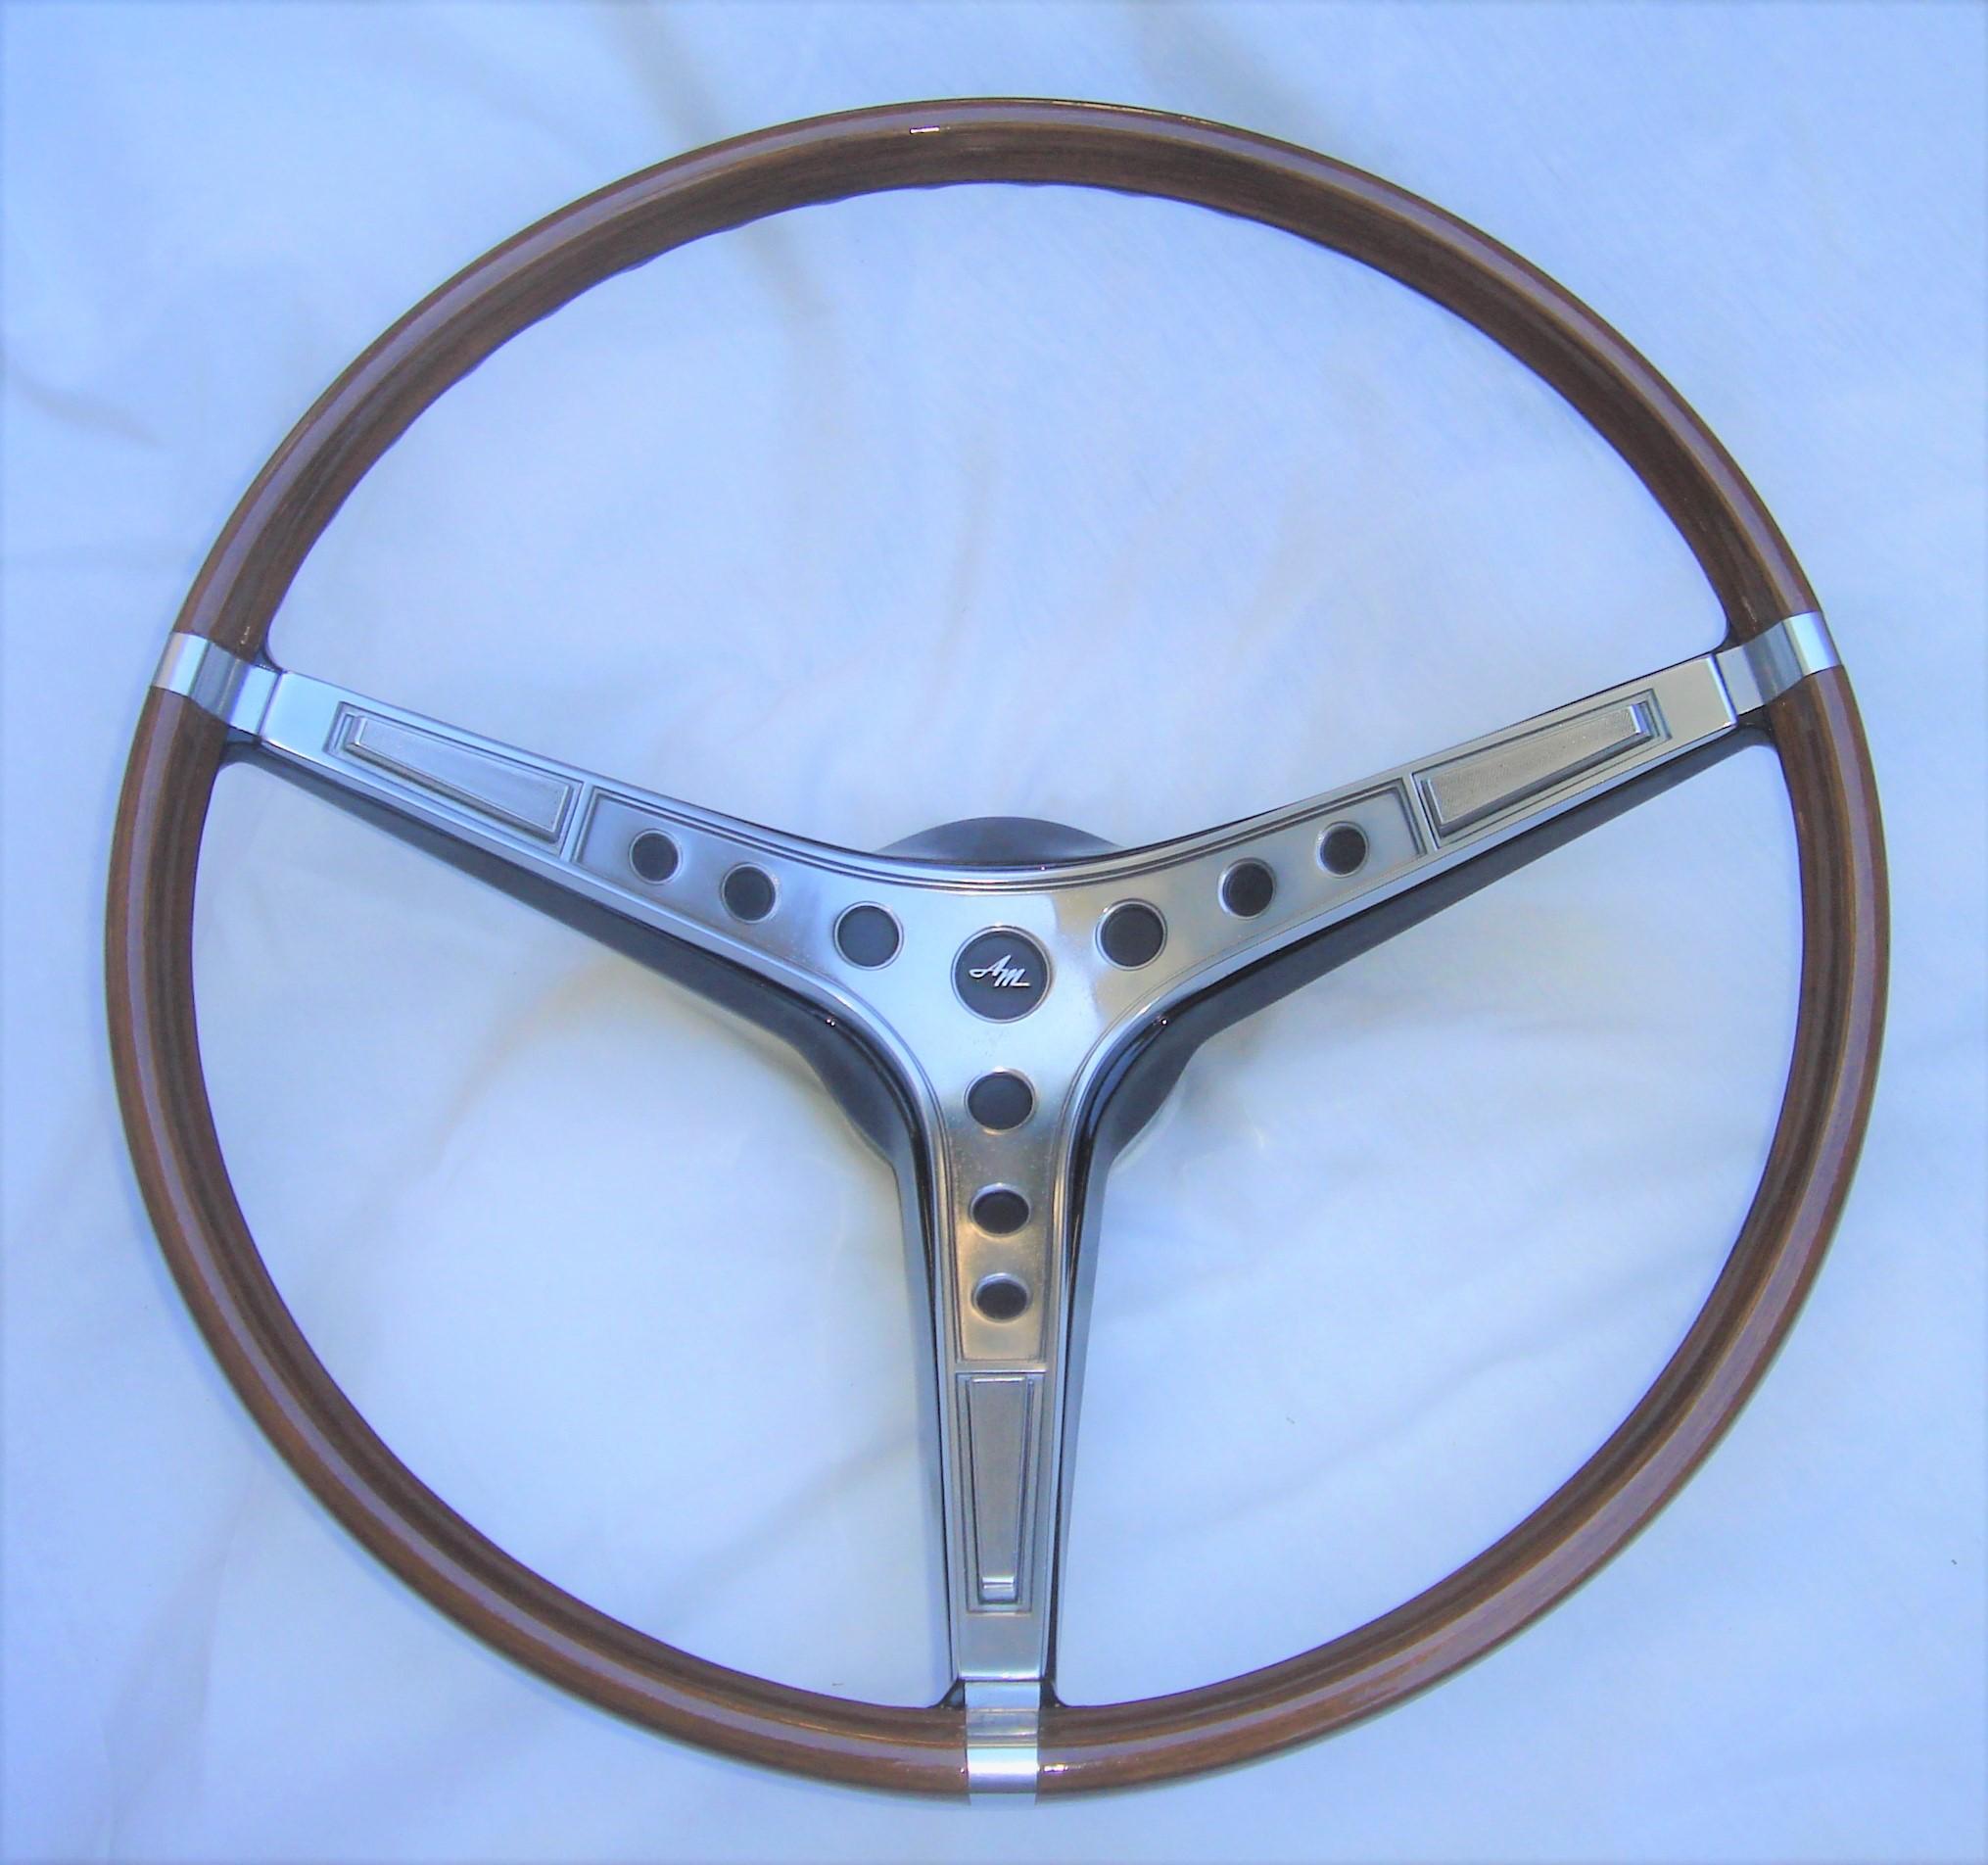 1969 AMC AMX steering wheel